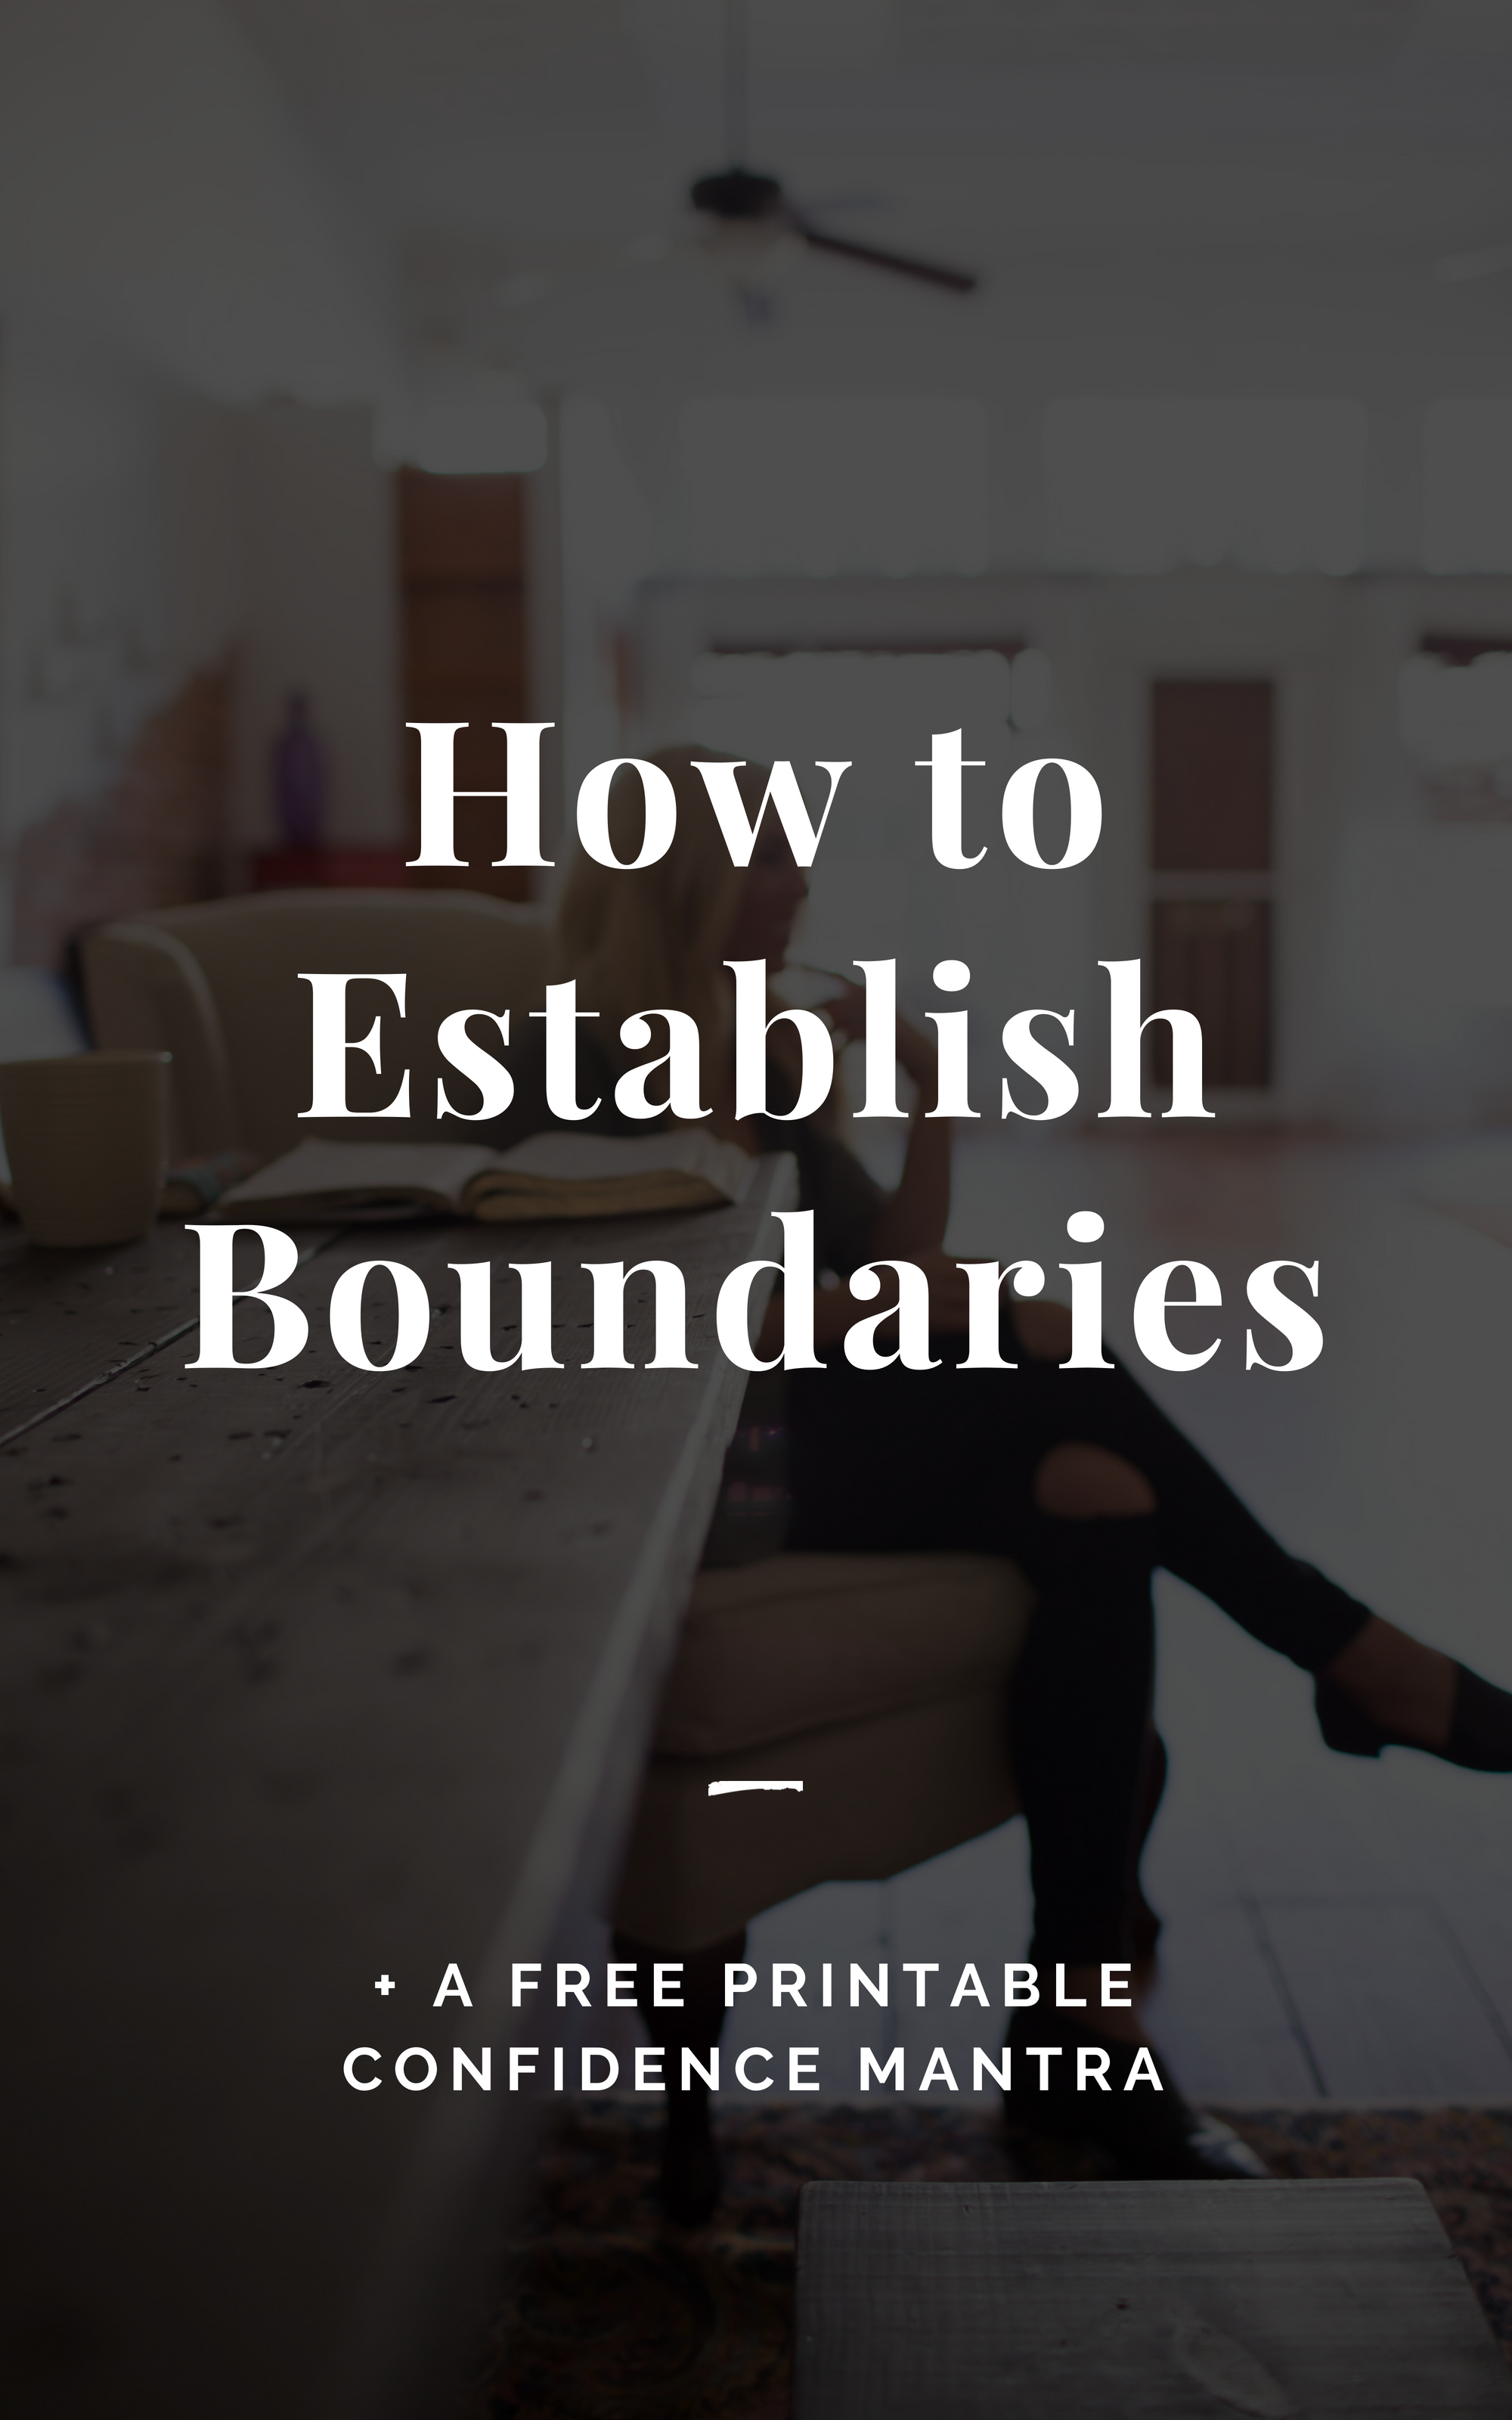 How to Establish Boundaries